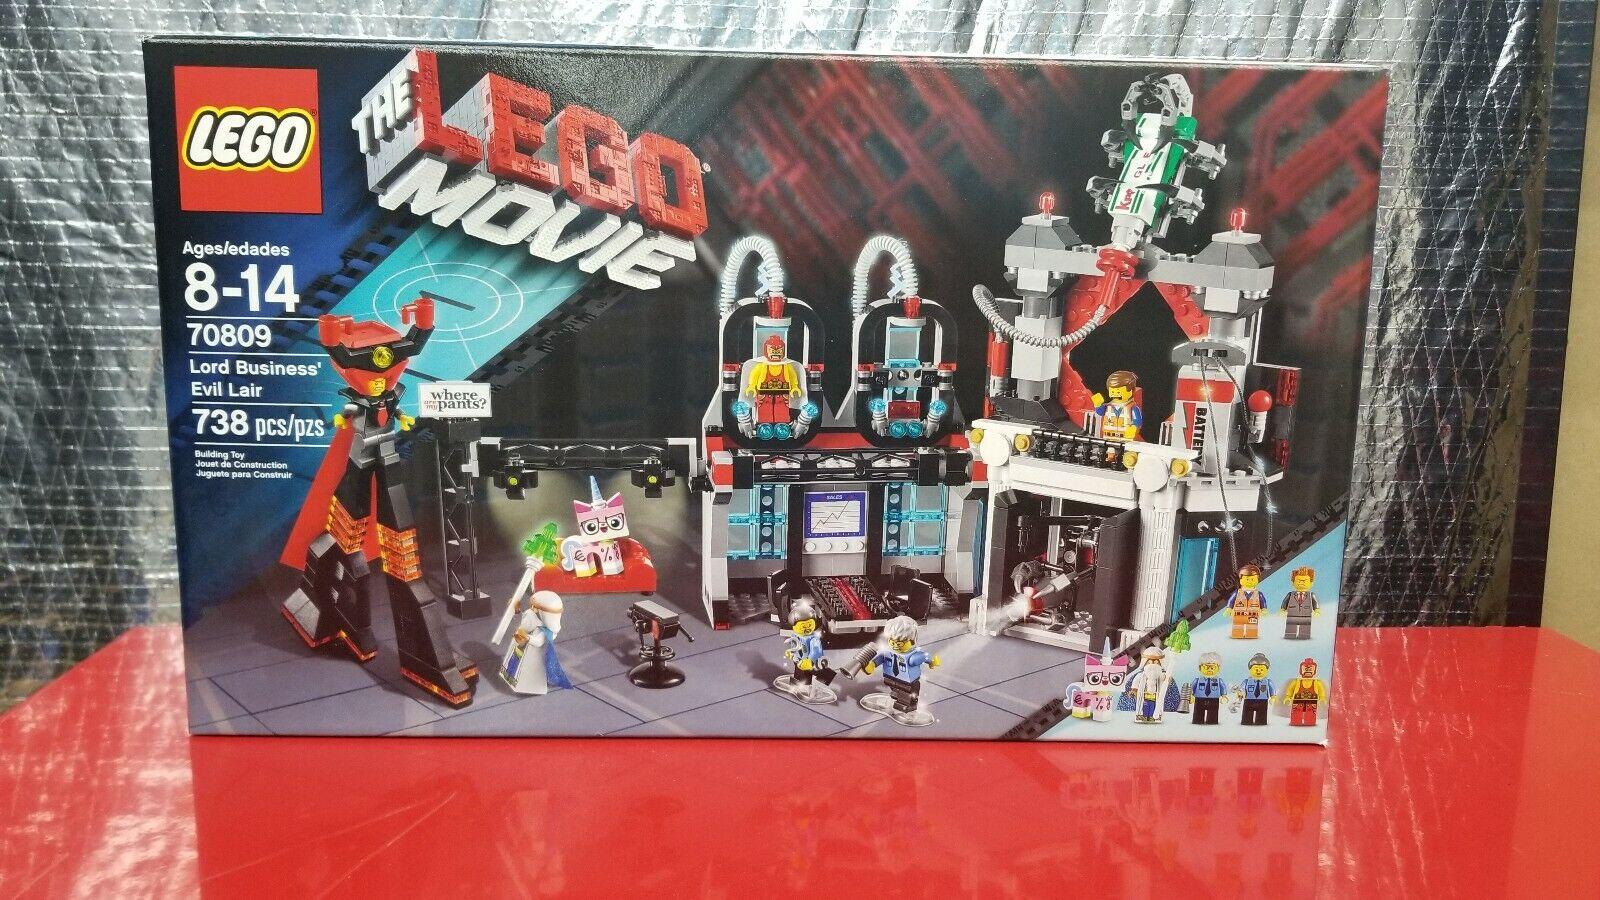 1 LEGO The LEGO Movie Set 70809  - Lord autobusiness' Evil Lair - nuovo, gratuito Shipping  risposte rapide